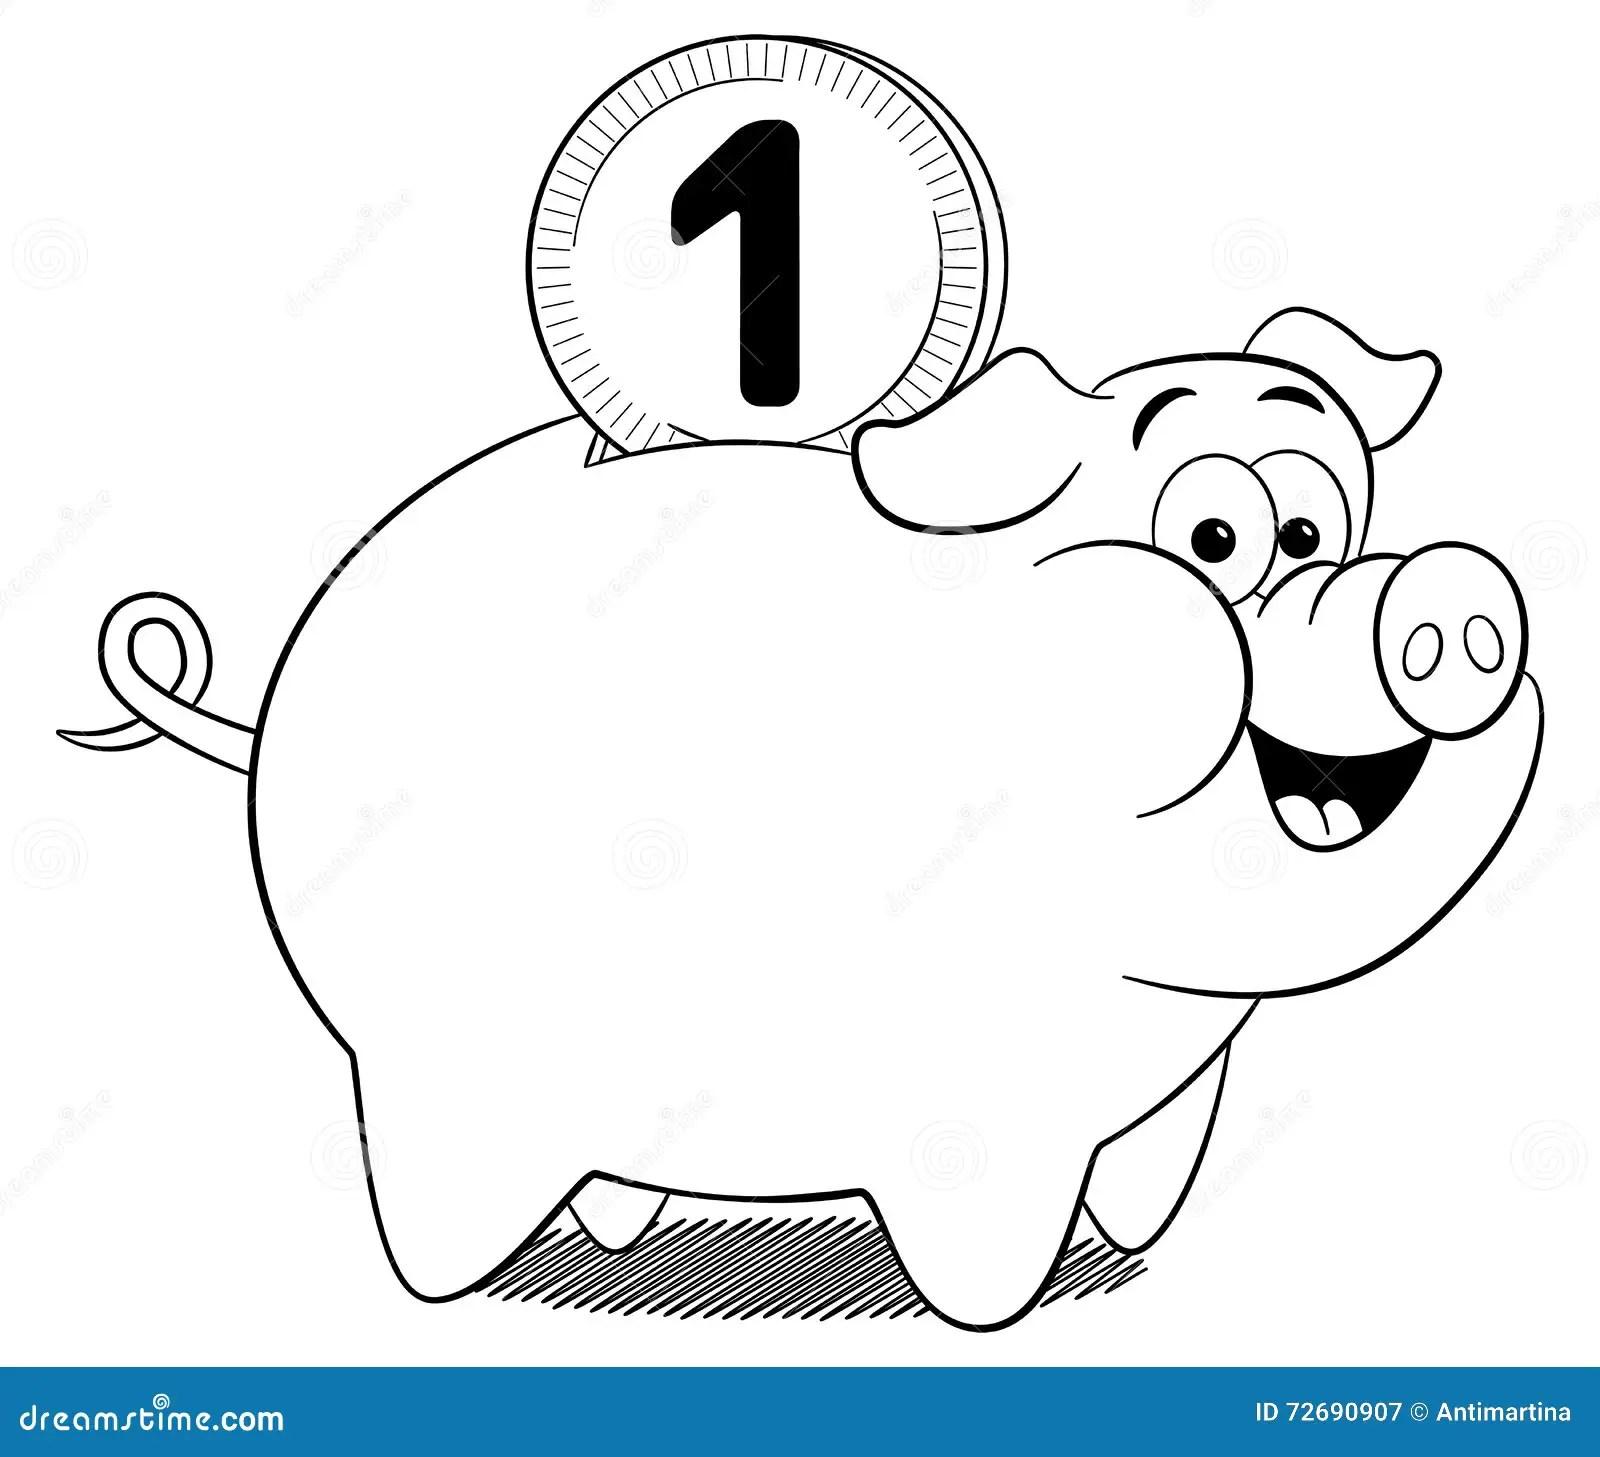 Cartoon Piggy Bank Stock Vector Illustration Of Banking